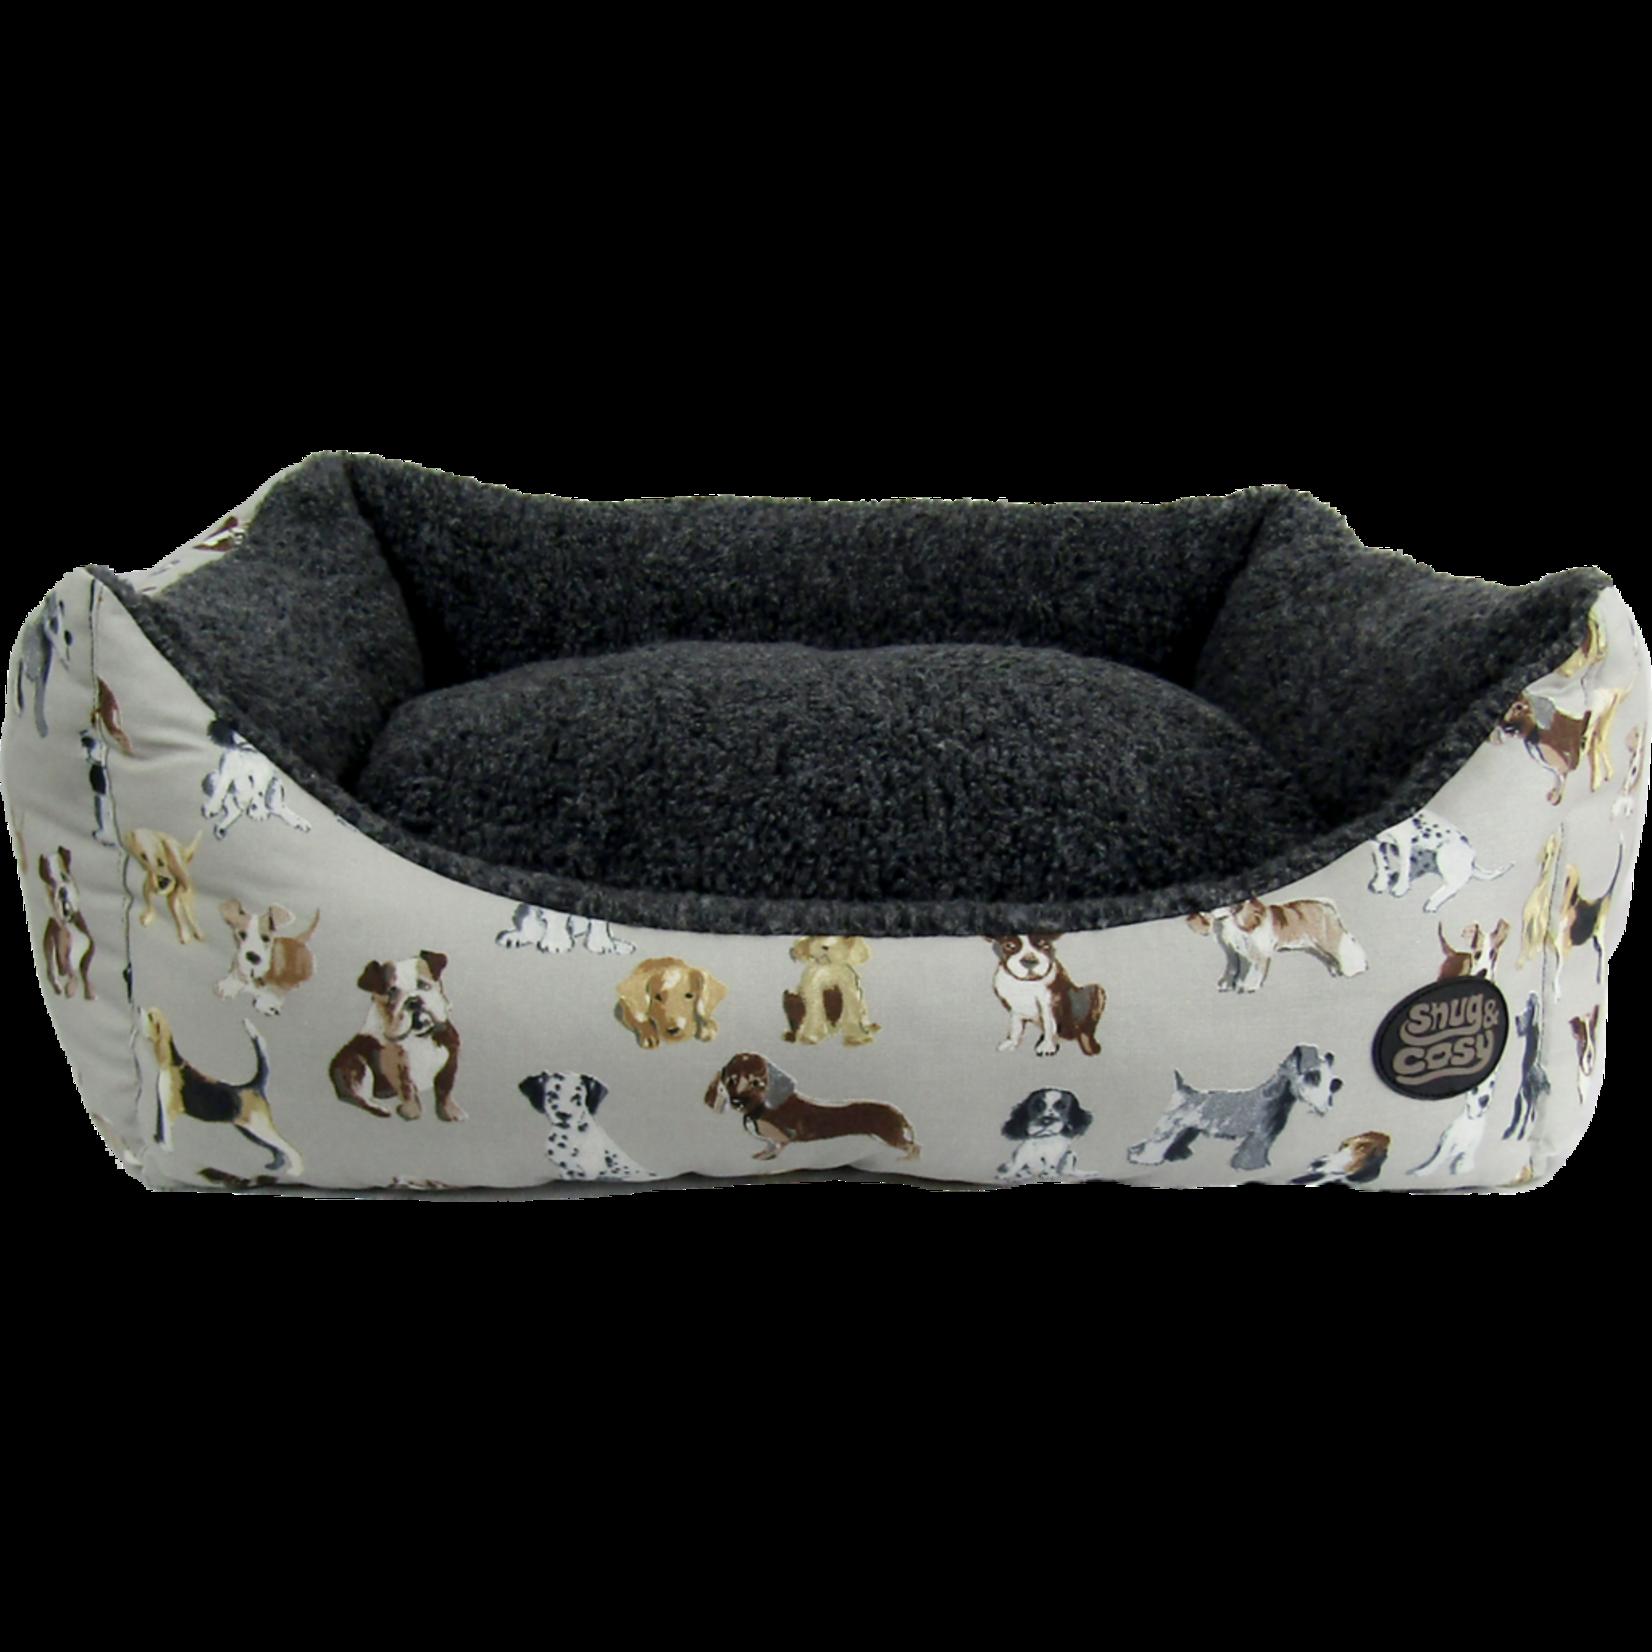 Snug & Cosy Dog Print Dog Bed